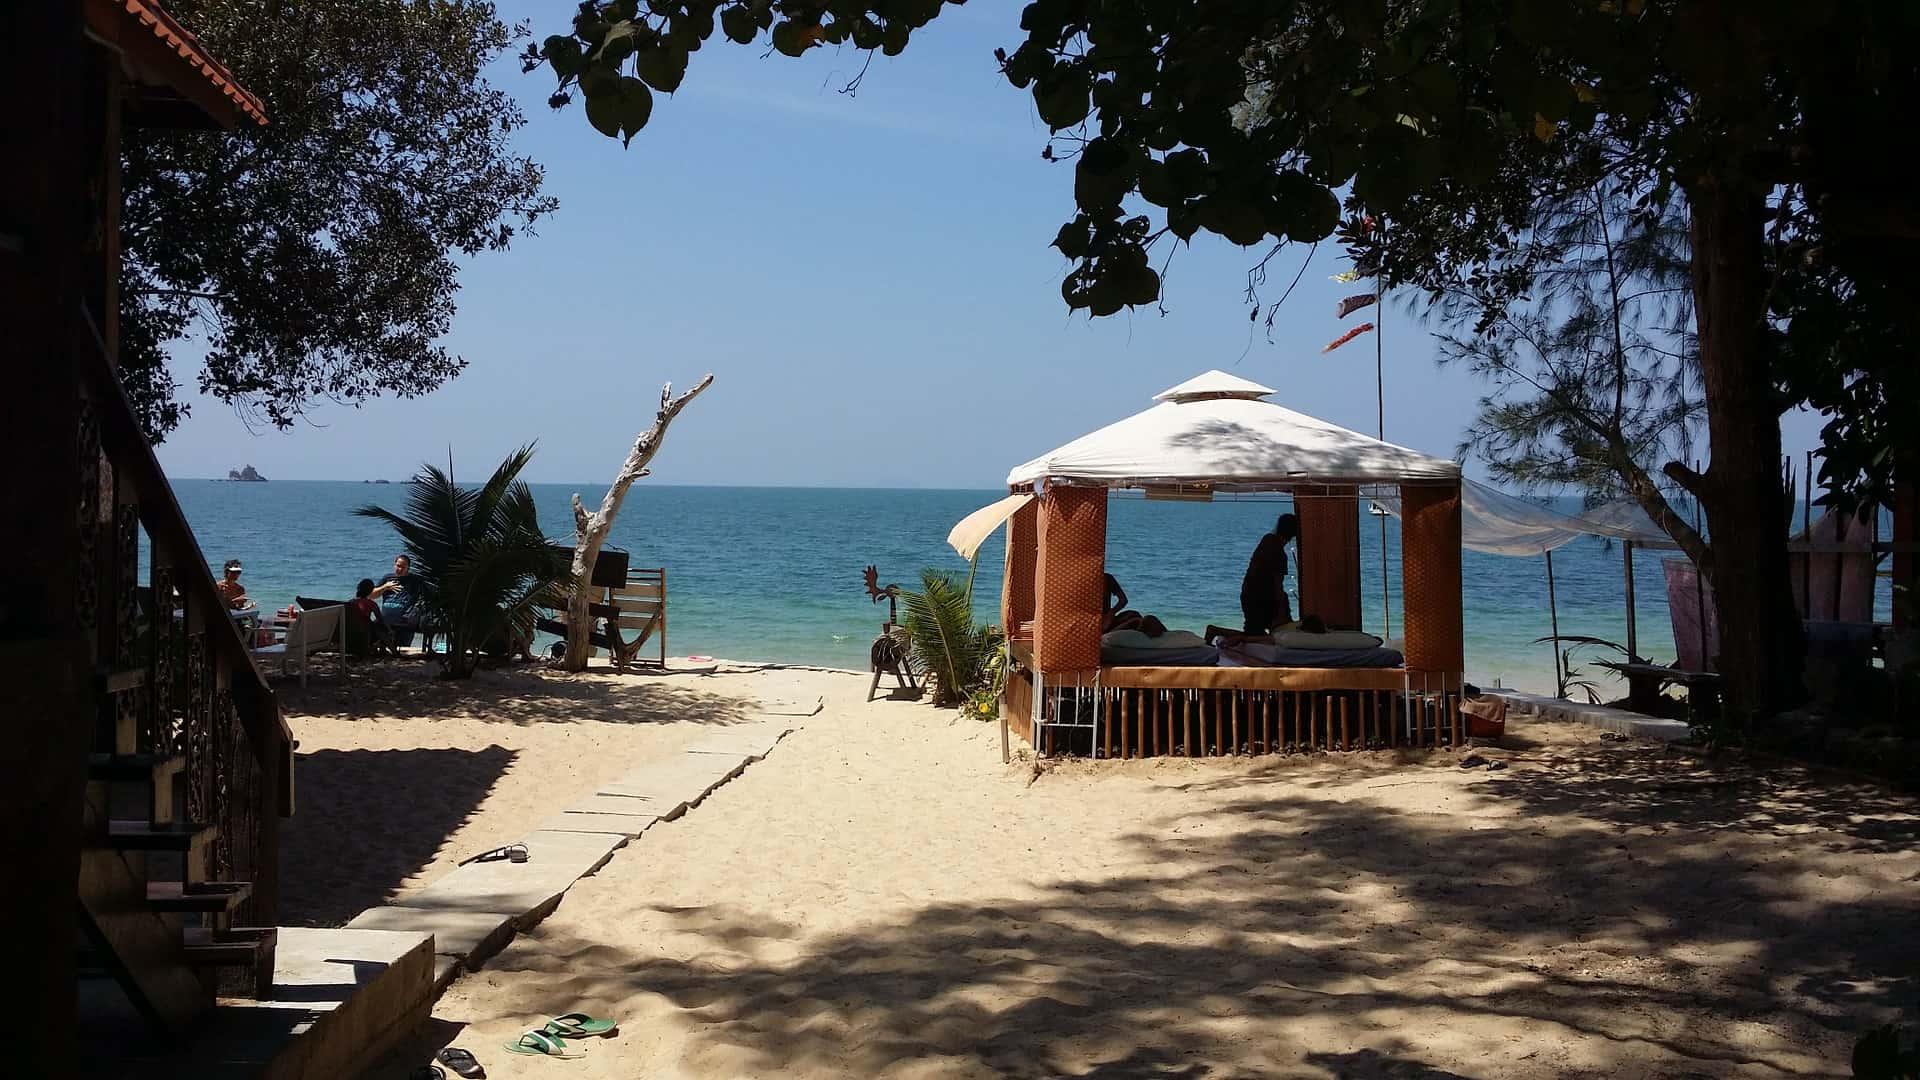 wellness tourism Soc sci med 2018 jan197:24-32 doi: 101016/jsocscimed201711052 epub  2017 nov 28 therapeutic landscapes and longevity: wellness tourism in bama.